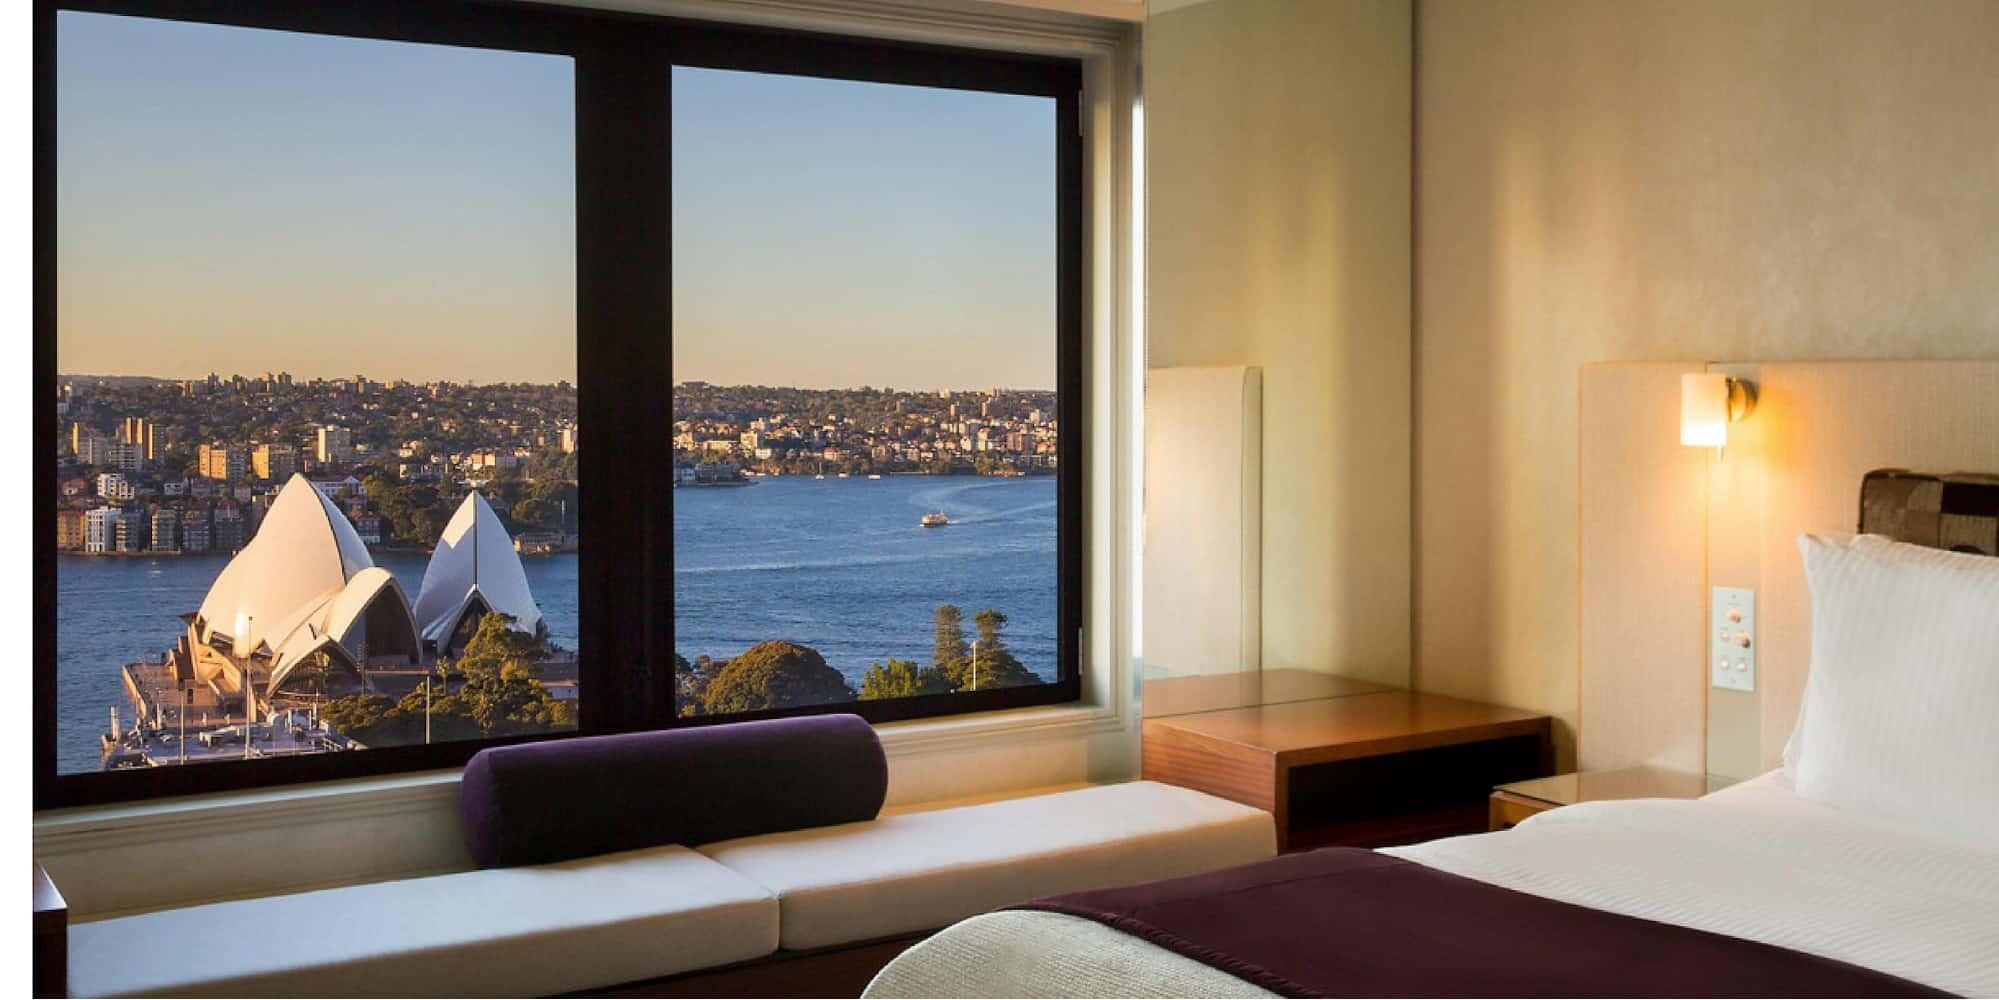 Best Hotels in Sydney - Intercontinental Sydney